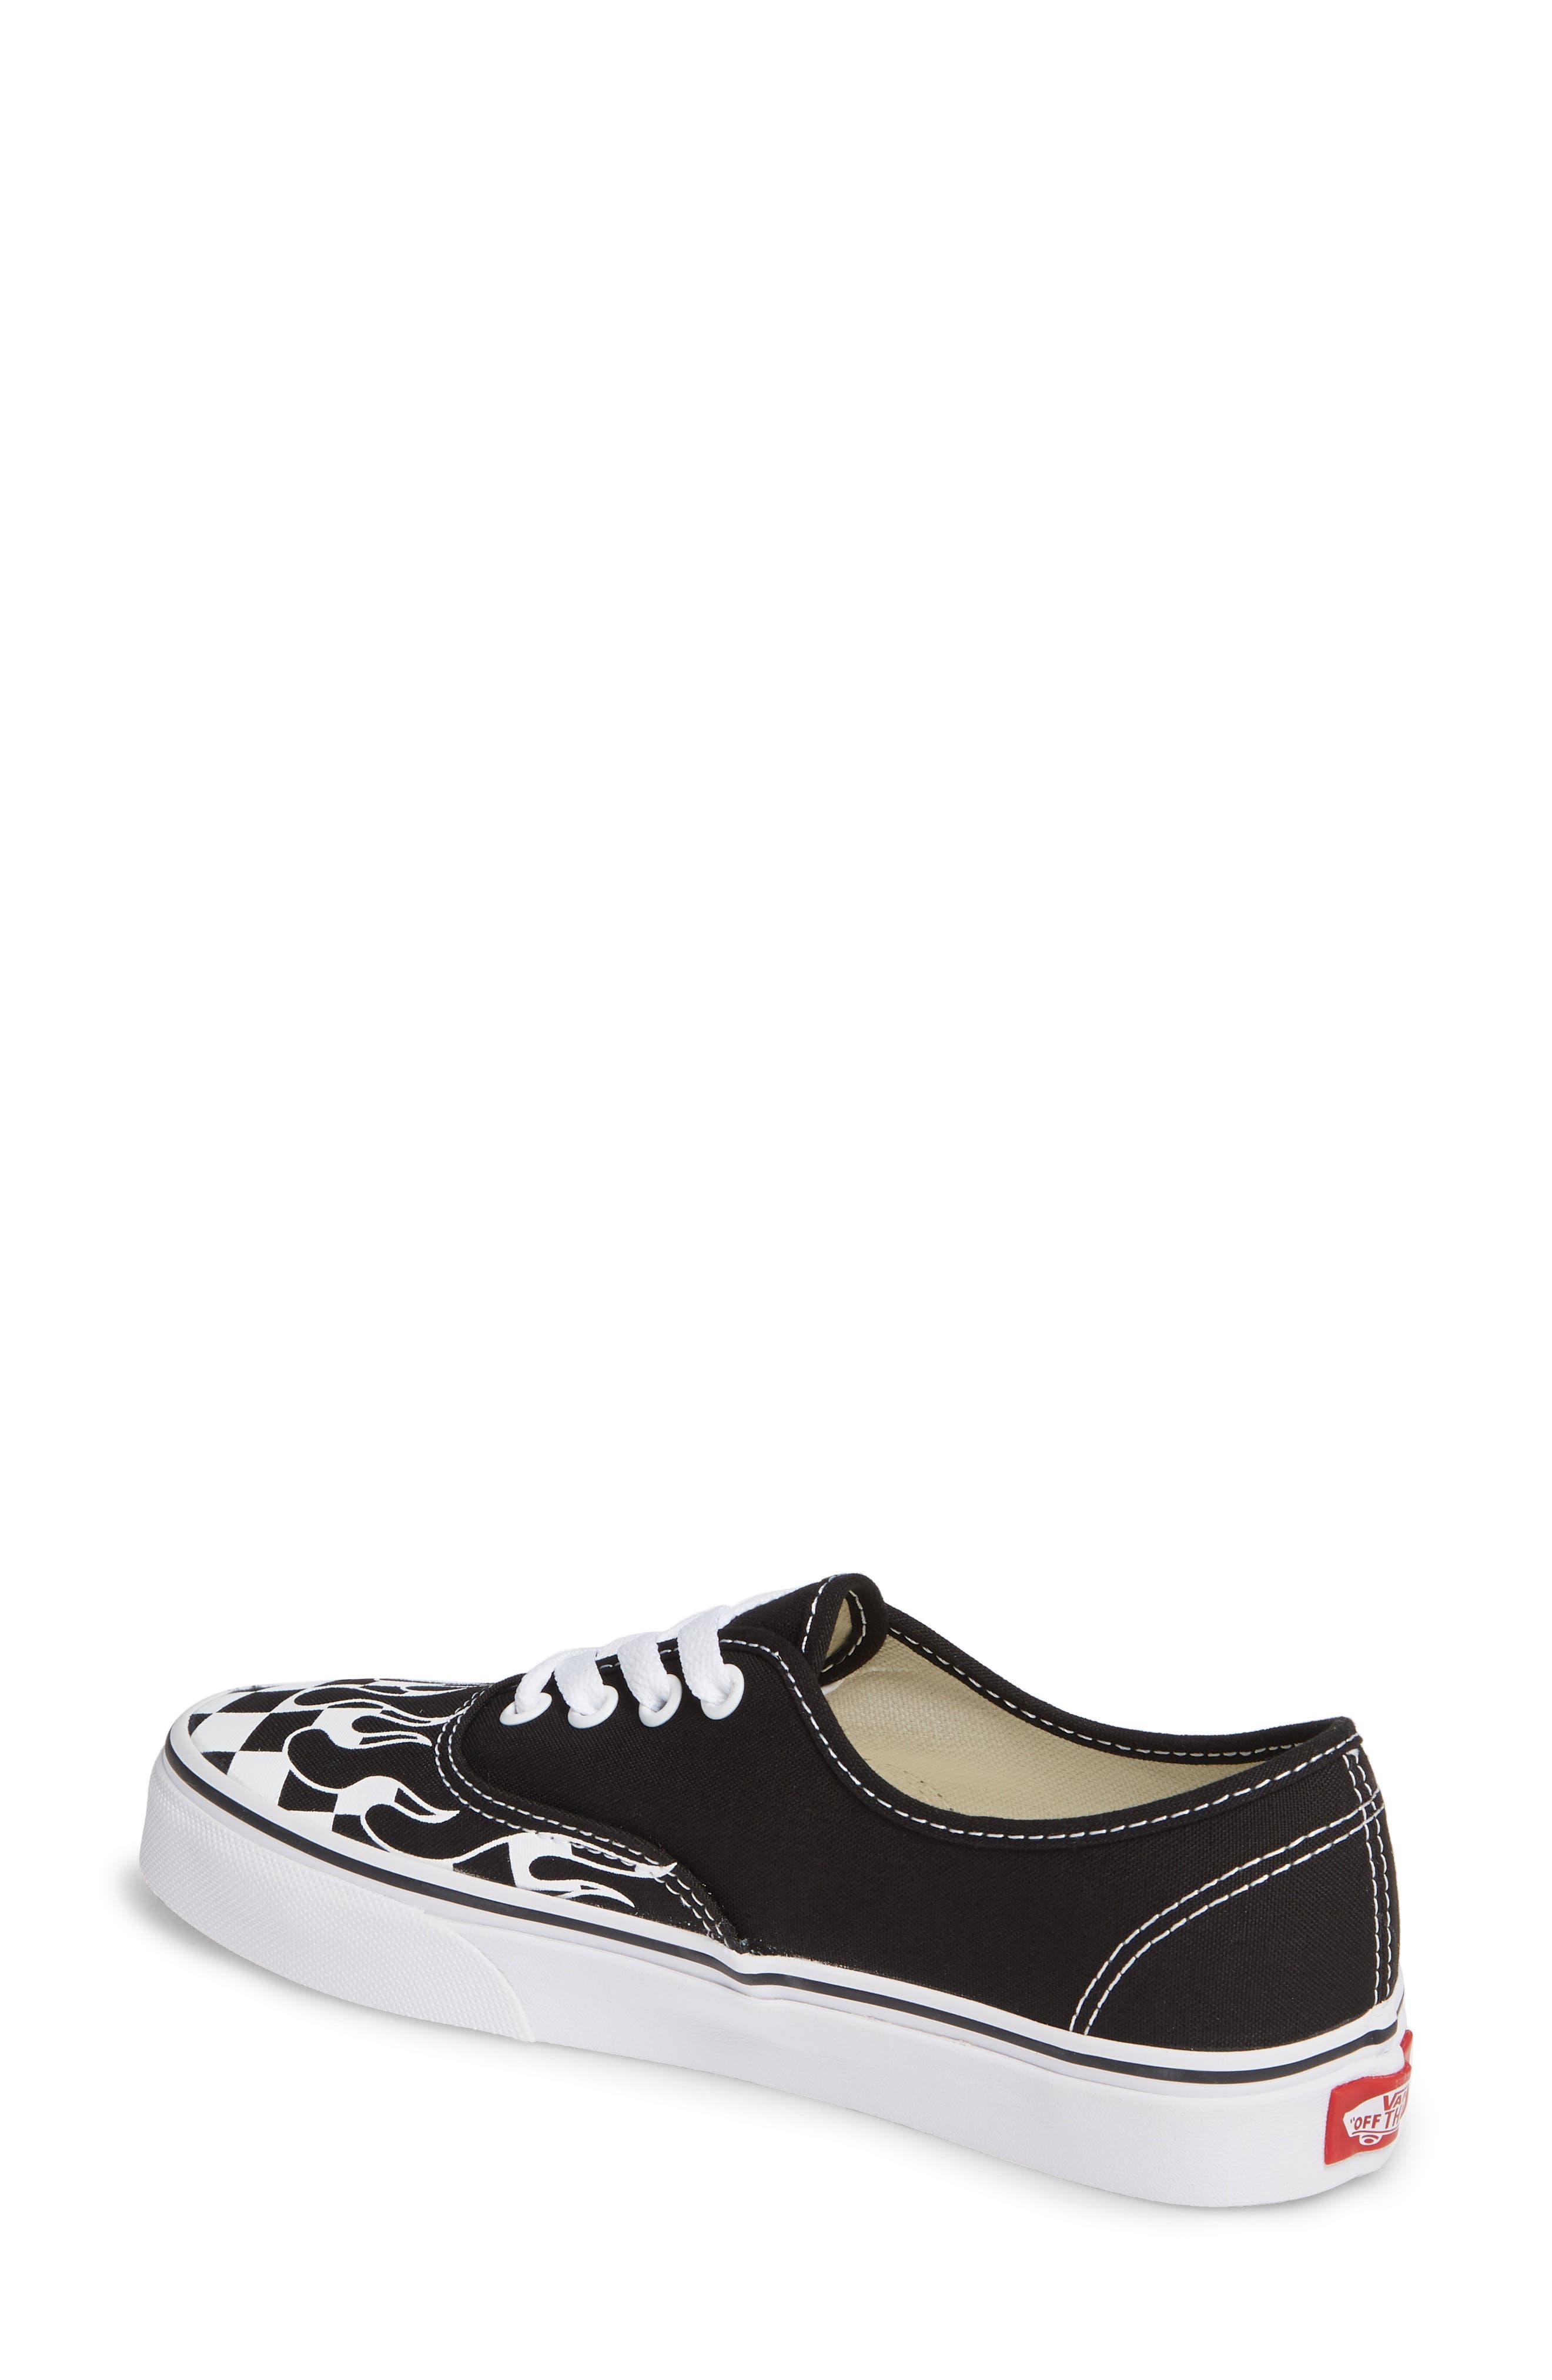 ,                             'Authentic' Sneaker,                             Alternate thumbnail 85, color,                             007